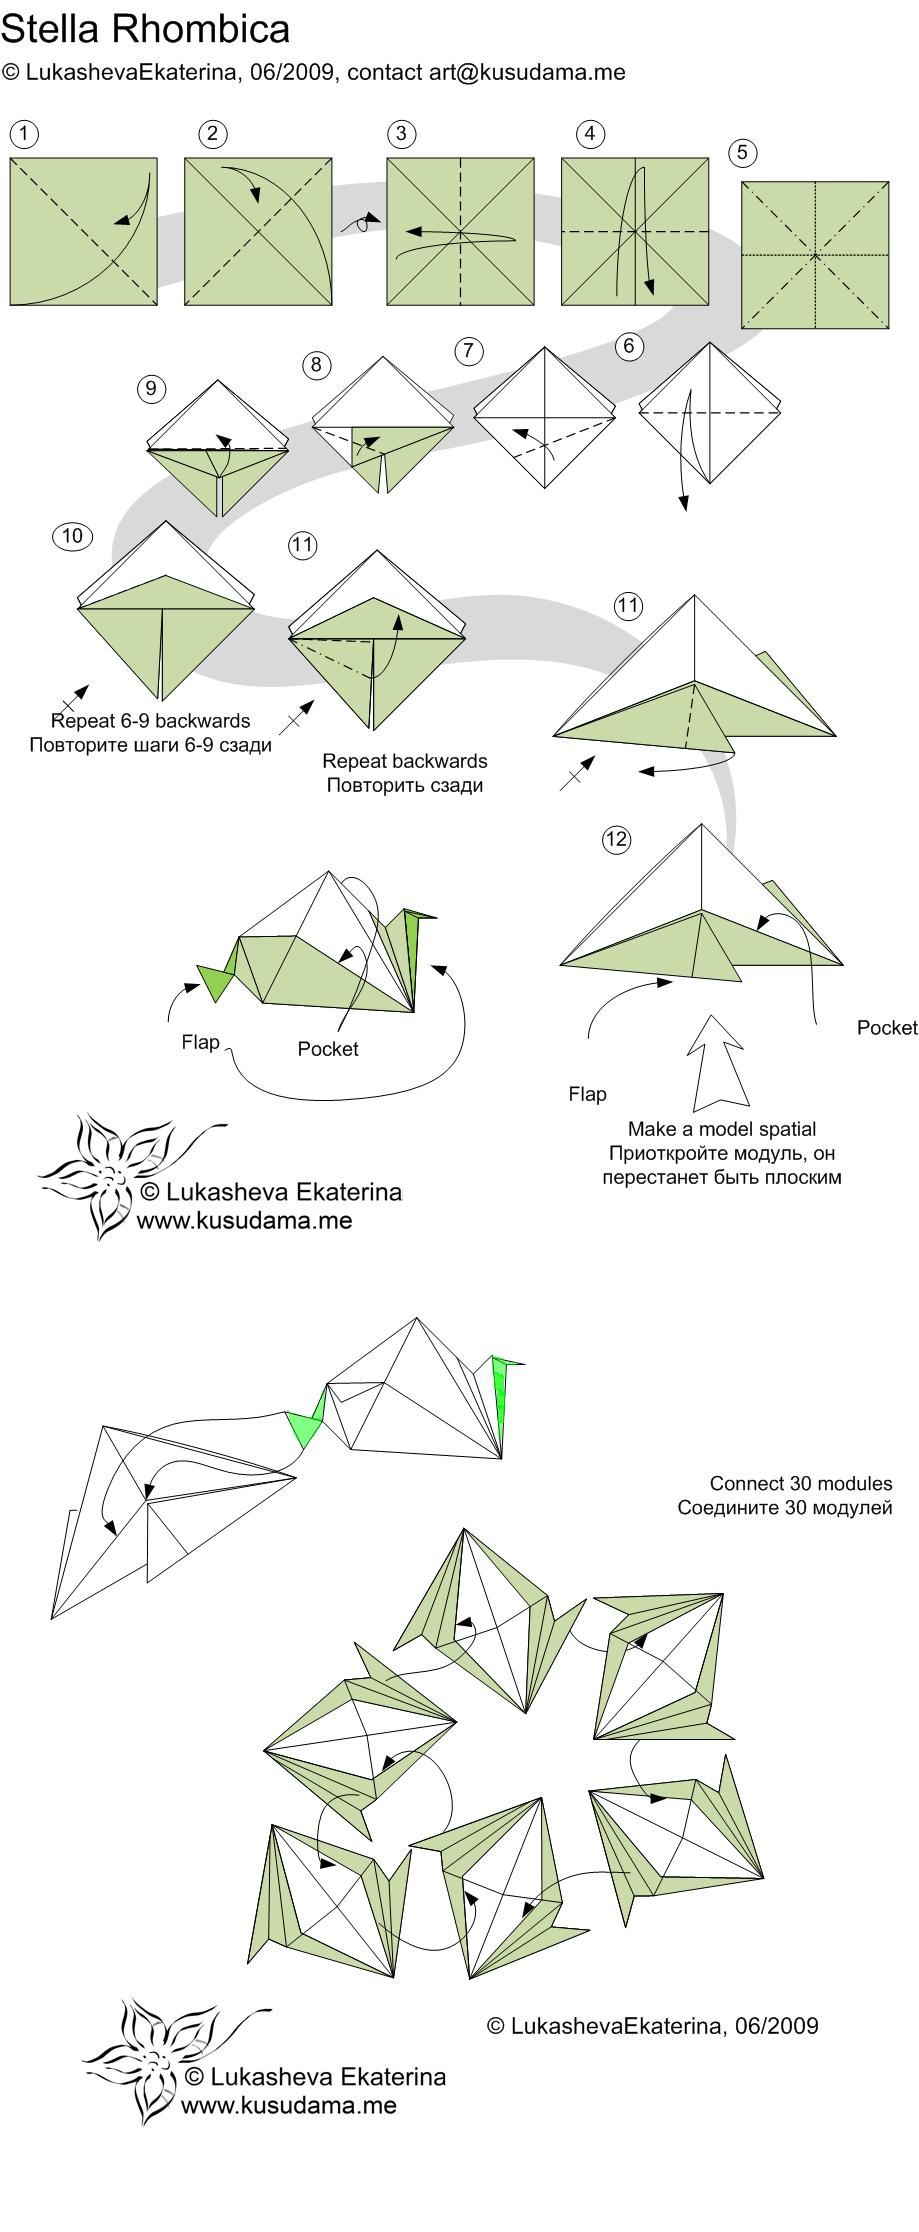 Kusudama me modular origami stellarhombica unit diagram for stellarhombica kusudama pooptronica